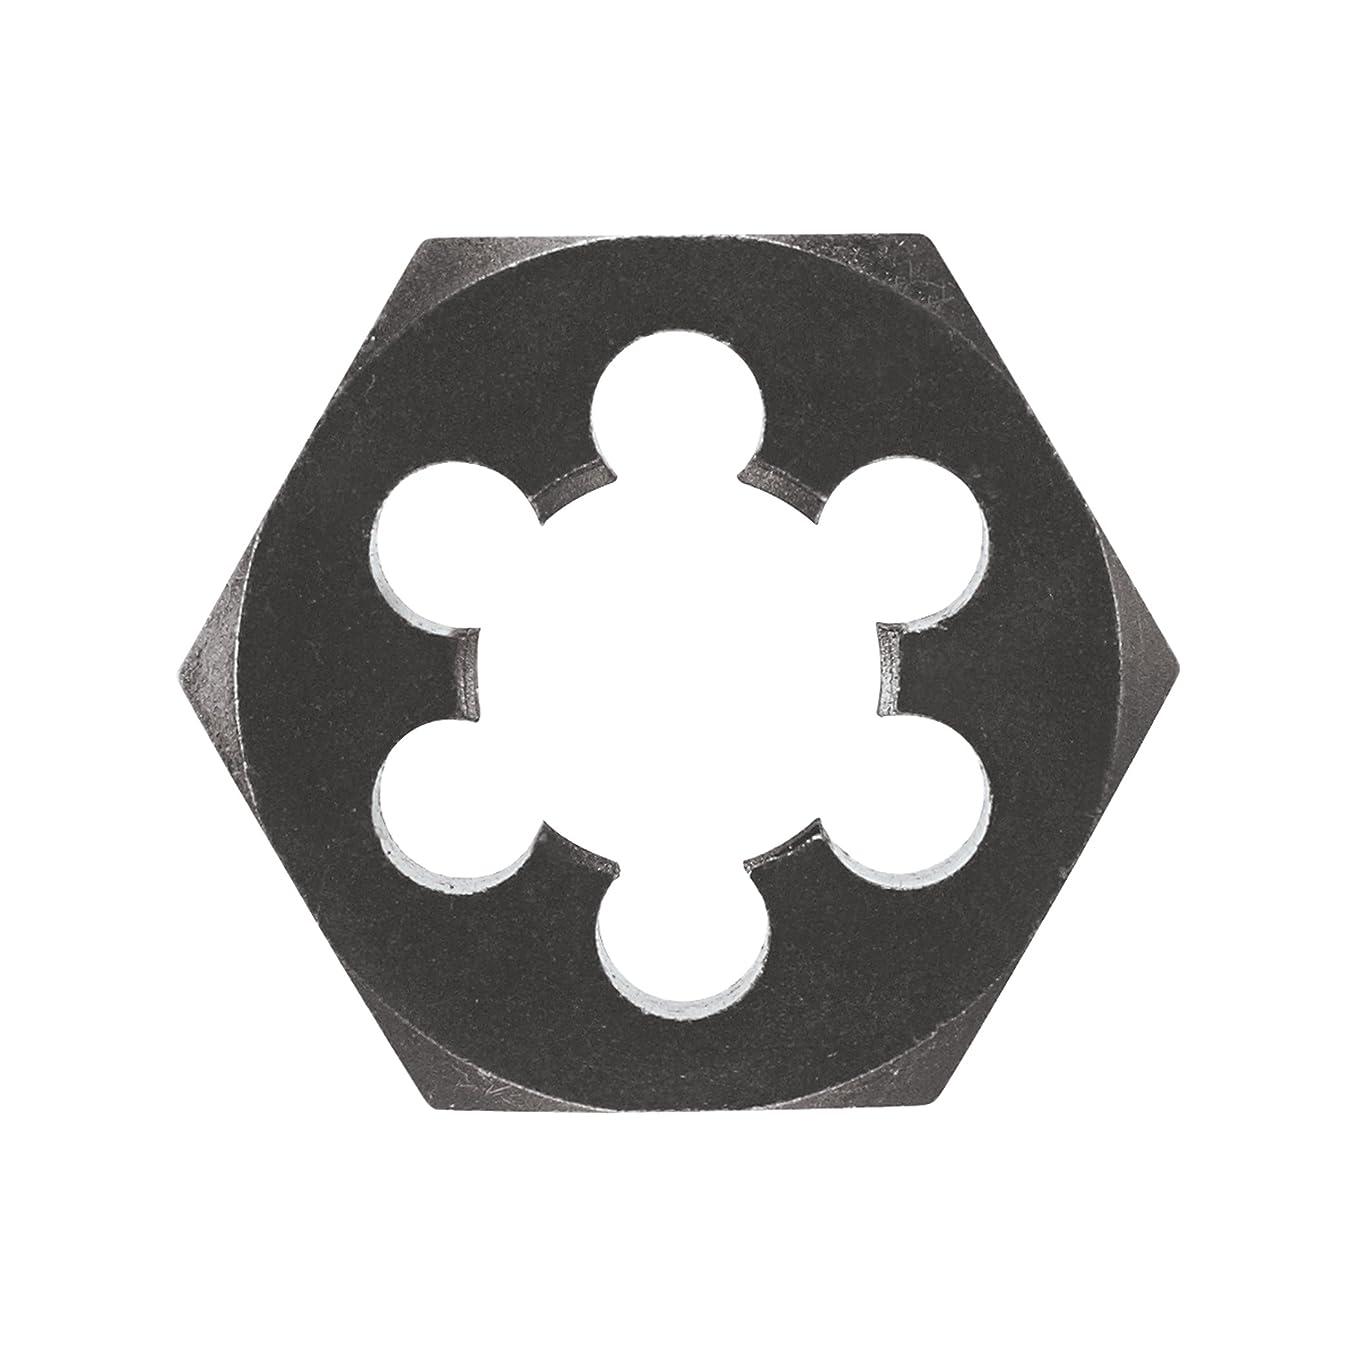 Bosch B46027 3/4-16 Size and Thread Black Oxide Hex Dies (Bulk)